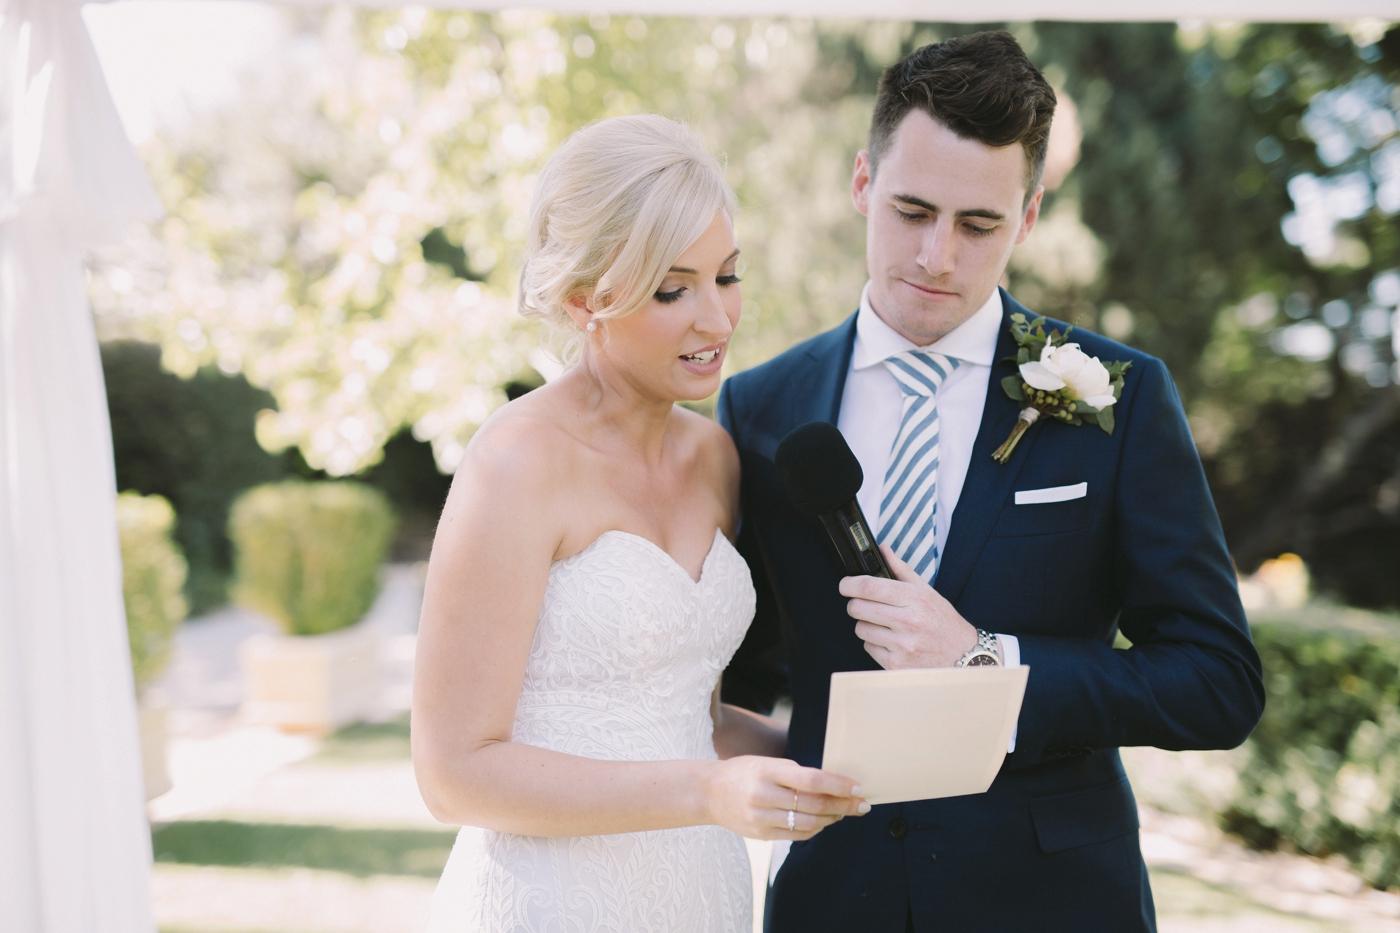 Lauren & Max - Marybank Estate Wedding - Natural wedding photographer in Adelaide - www.katherineschultzphotography.com 63